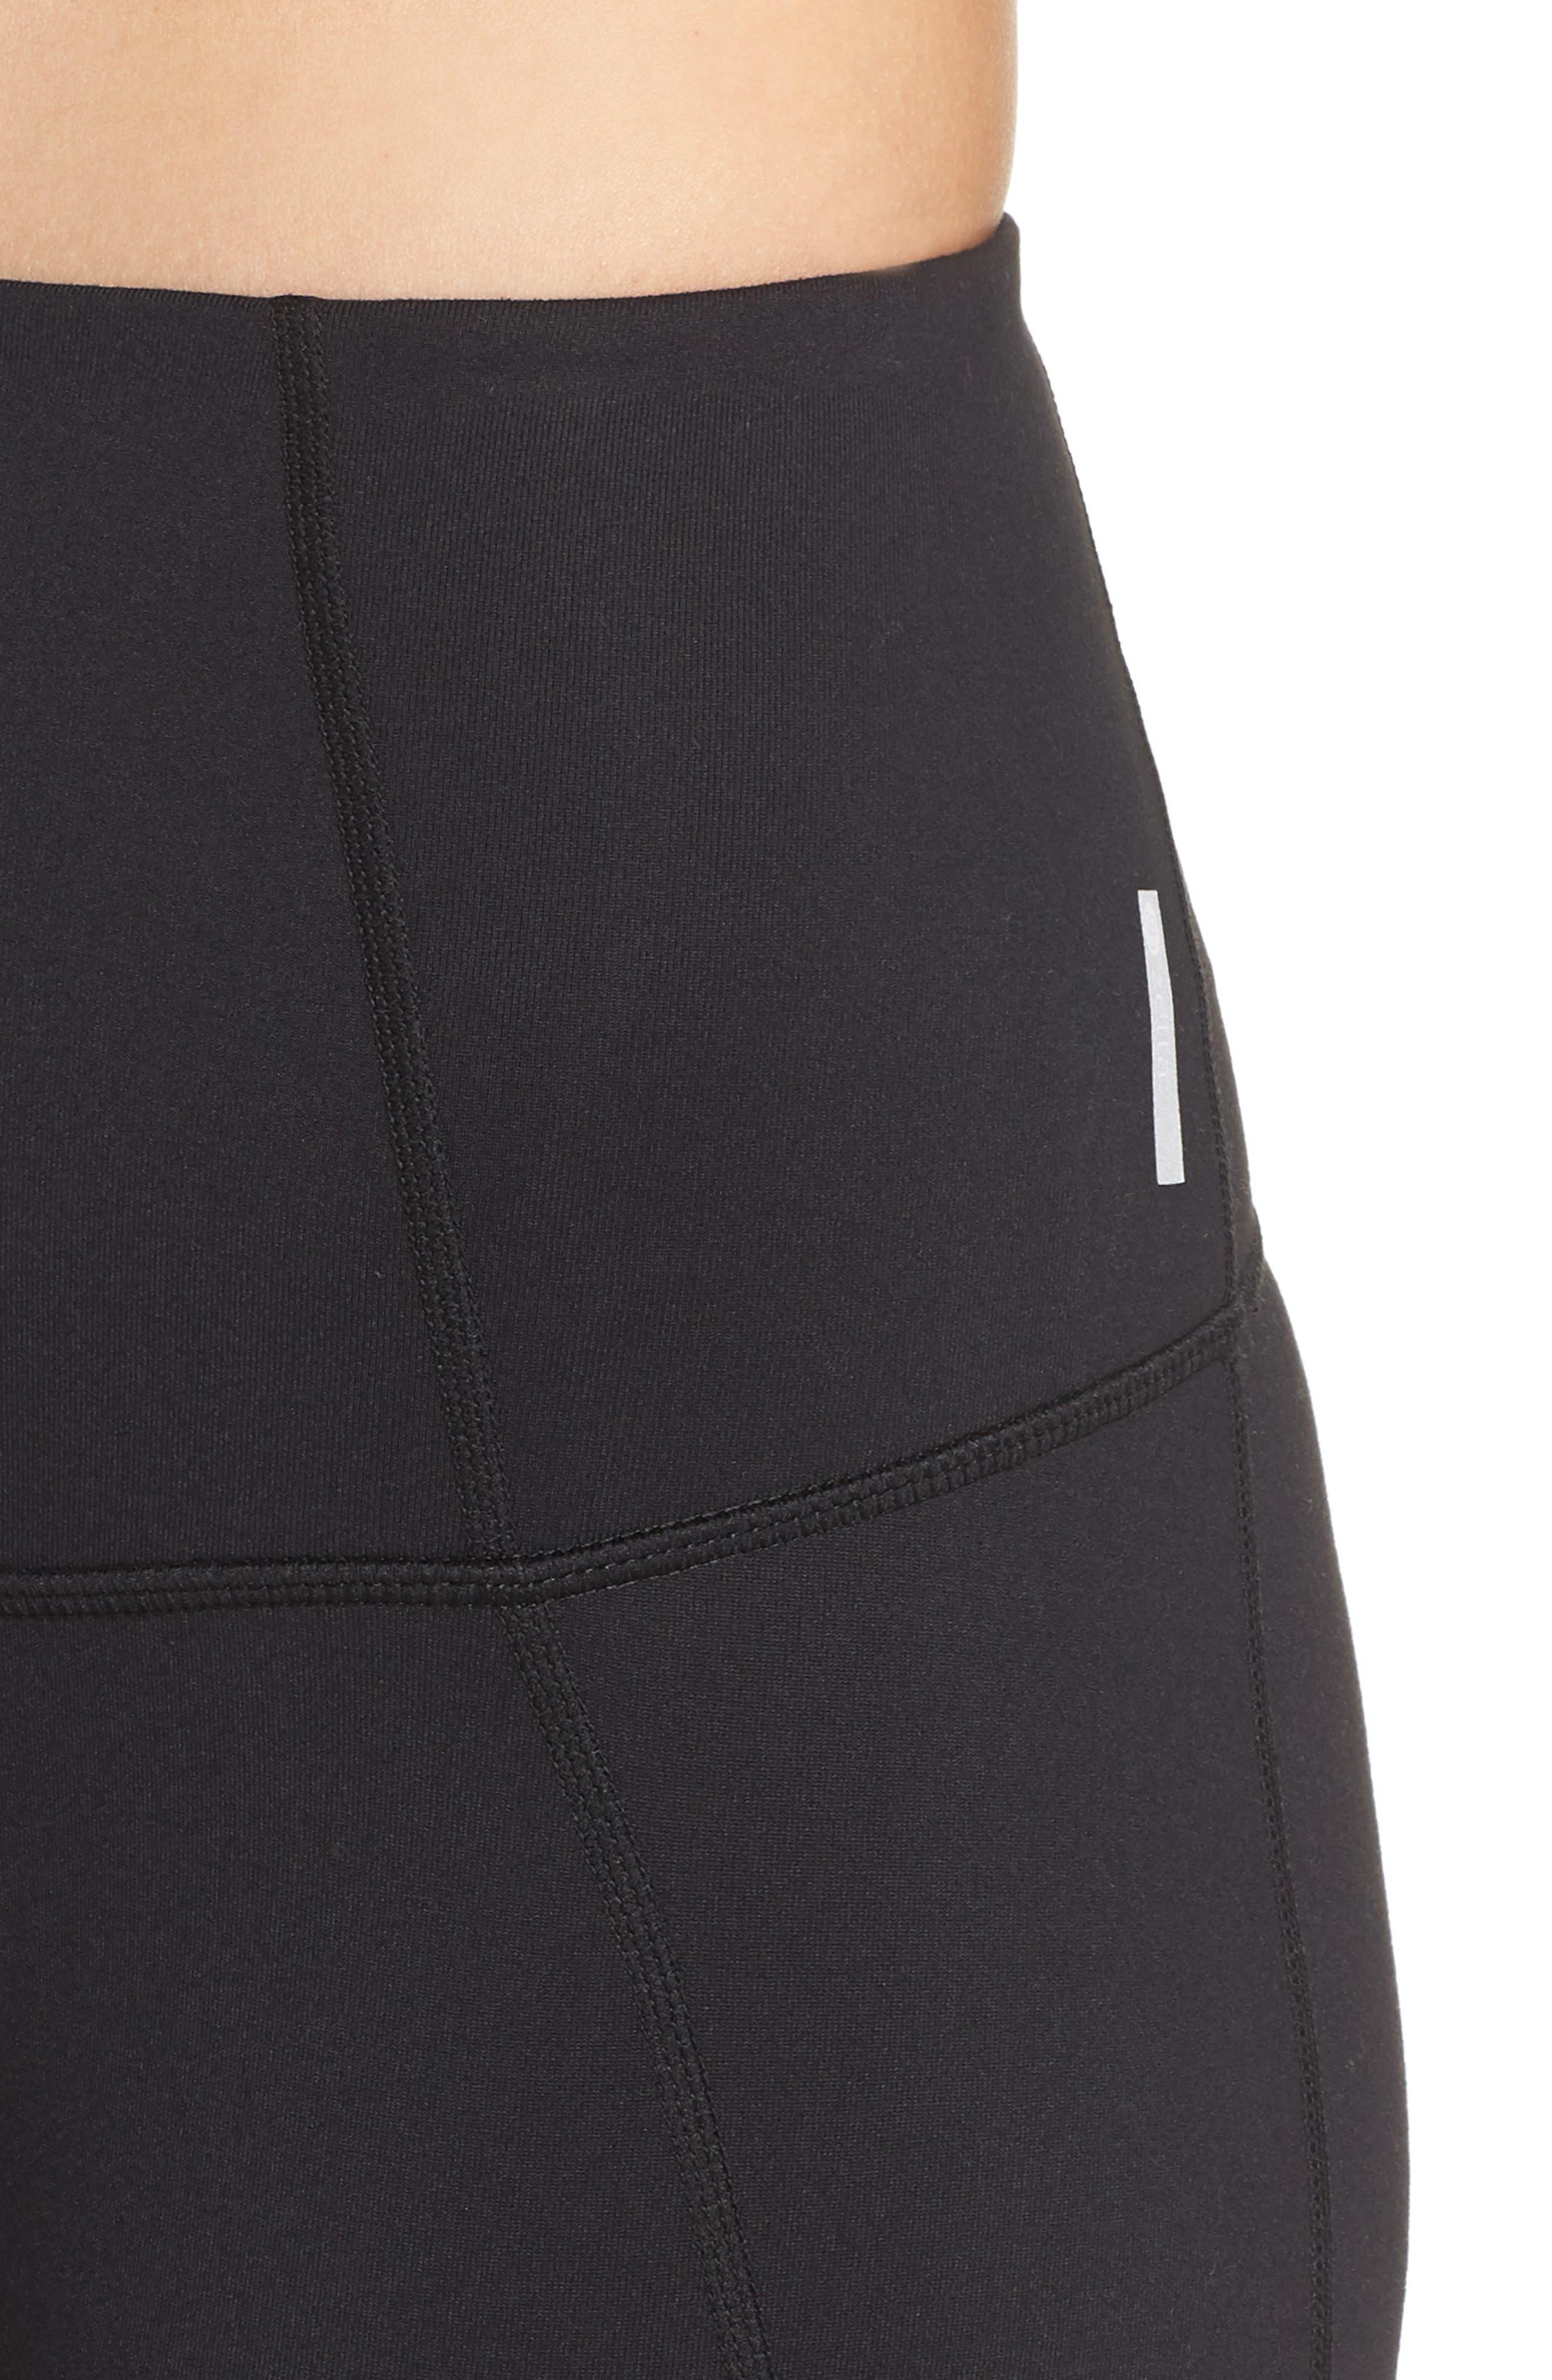 ZELLA, Hatha High Waist Bike Shorts, Alternate thumbnail 5, color, BLACK